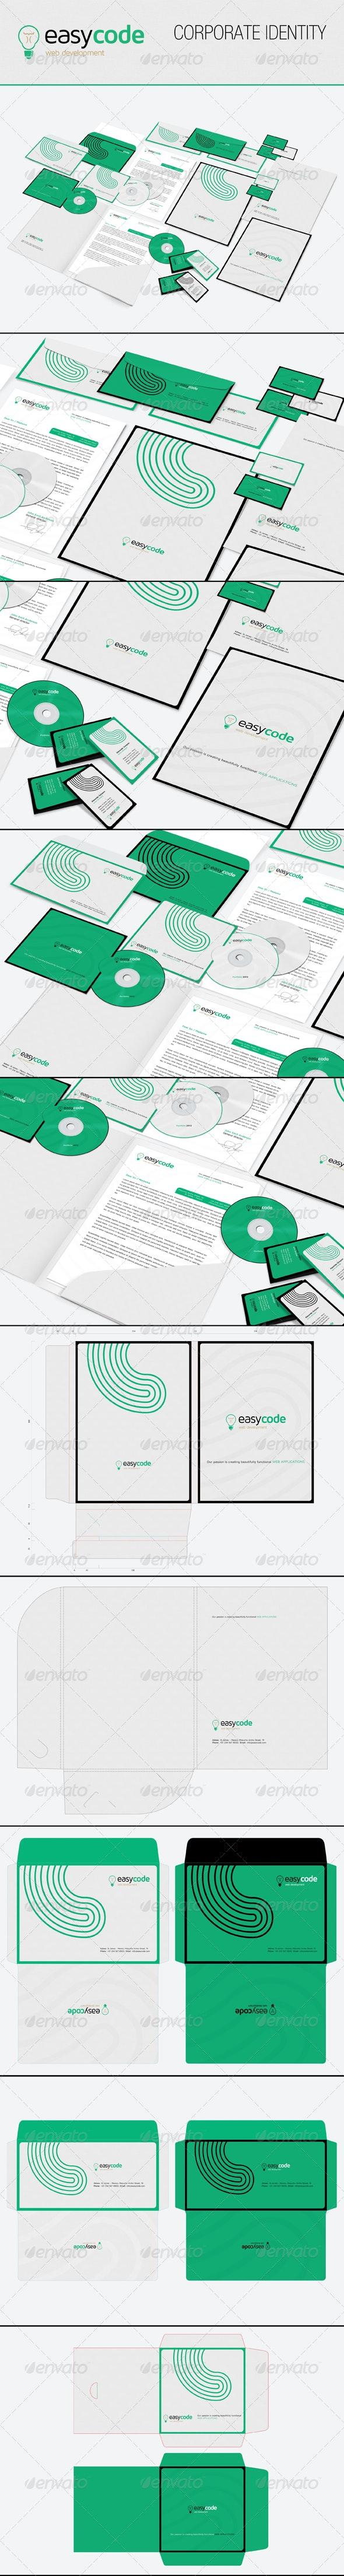 Easy Code Corporate Identity - Print Templates